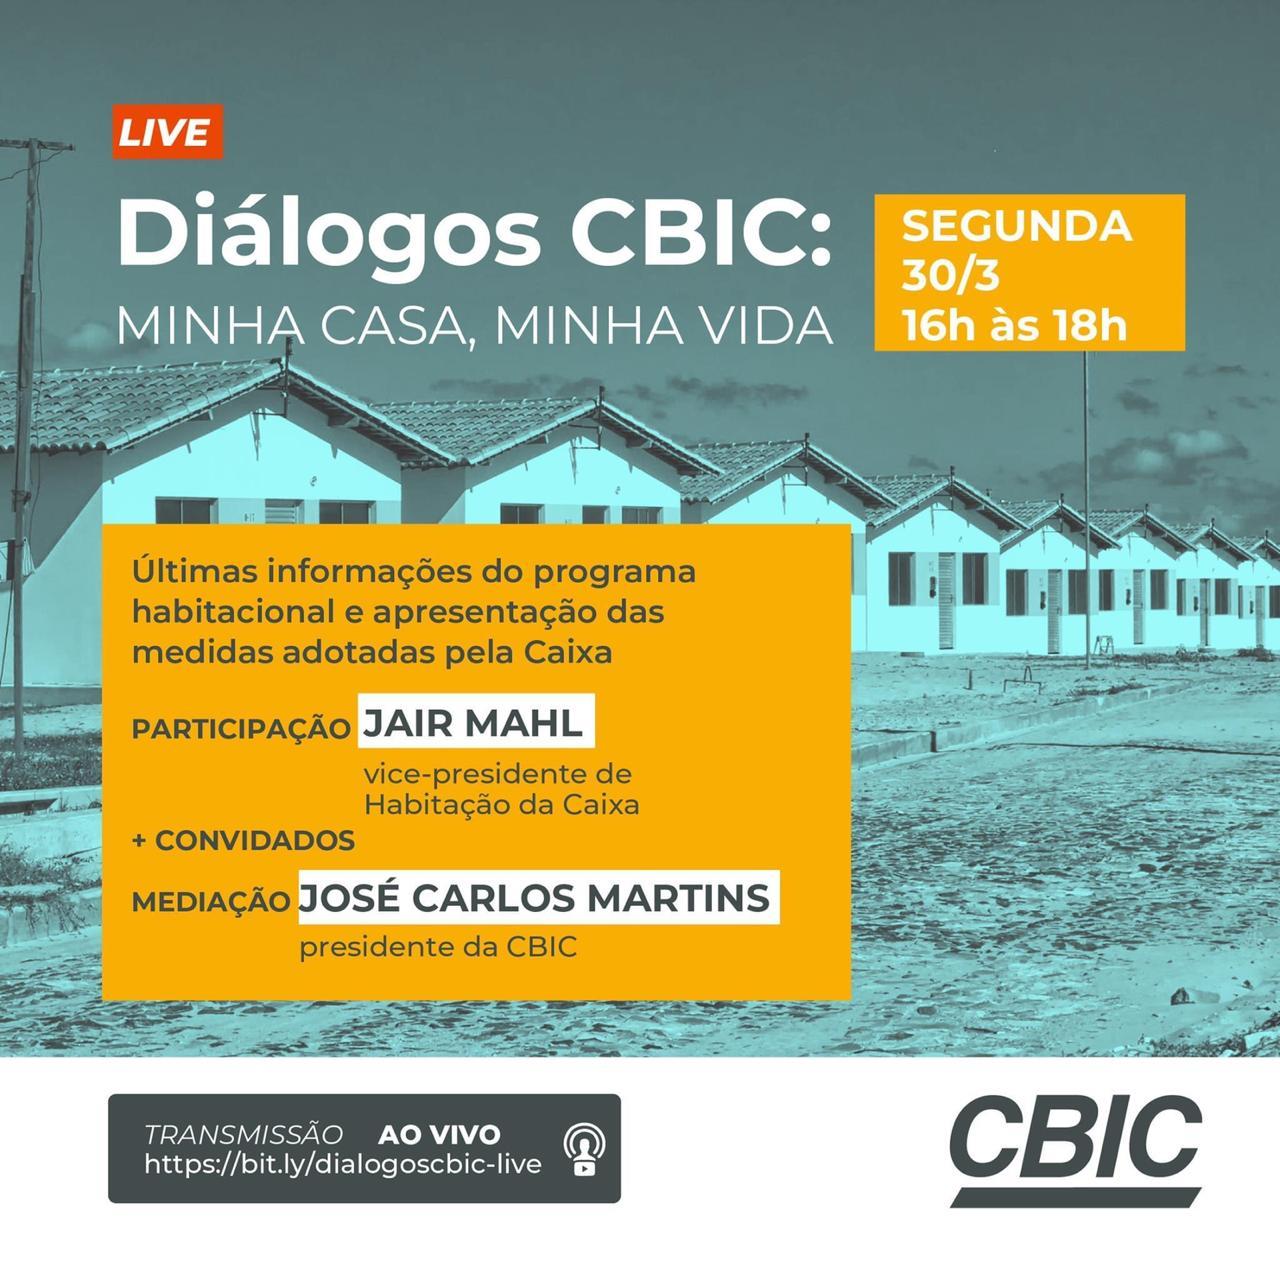 Diálogos CBIC 30.03